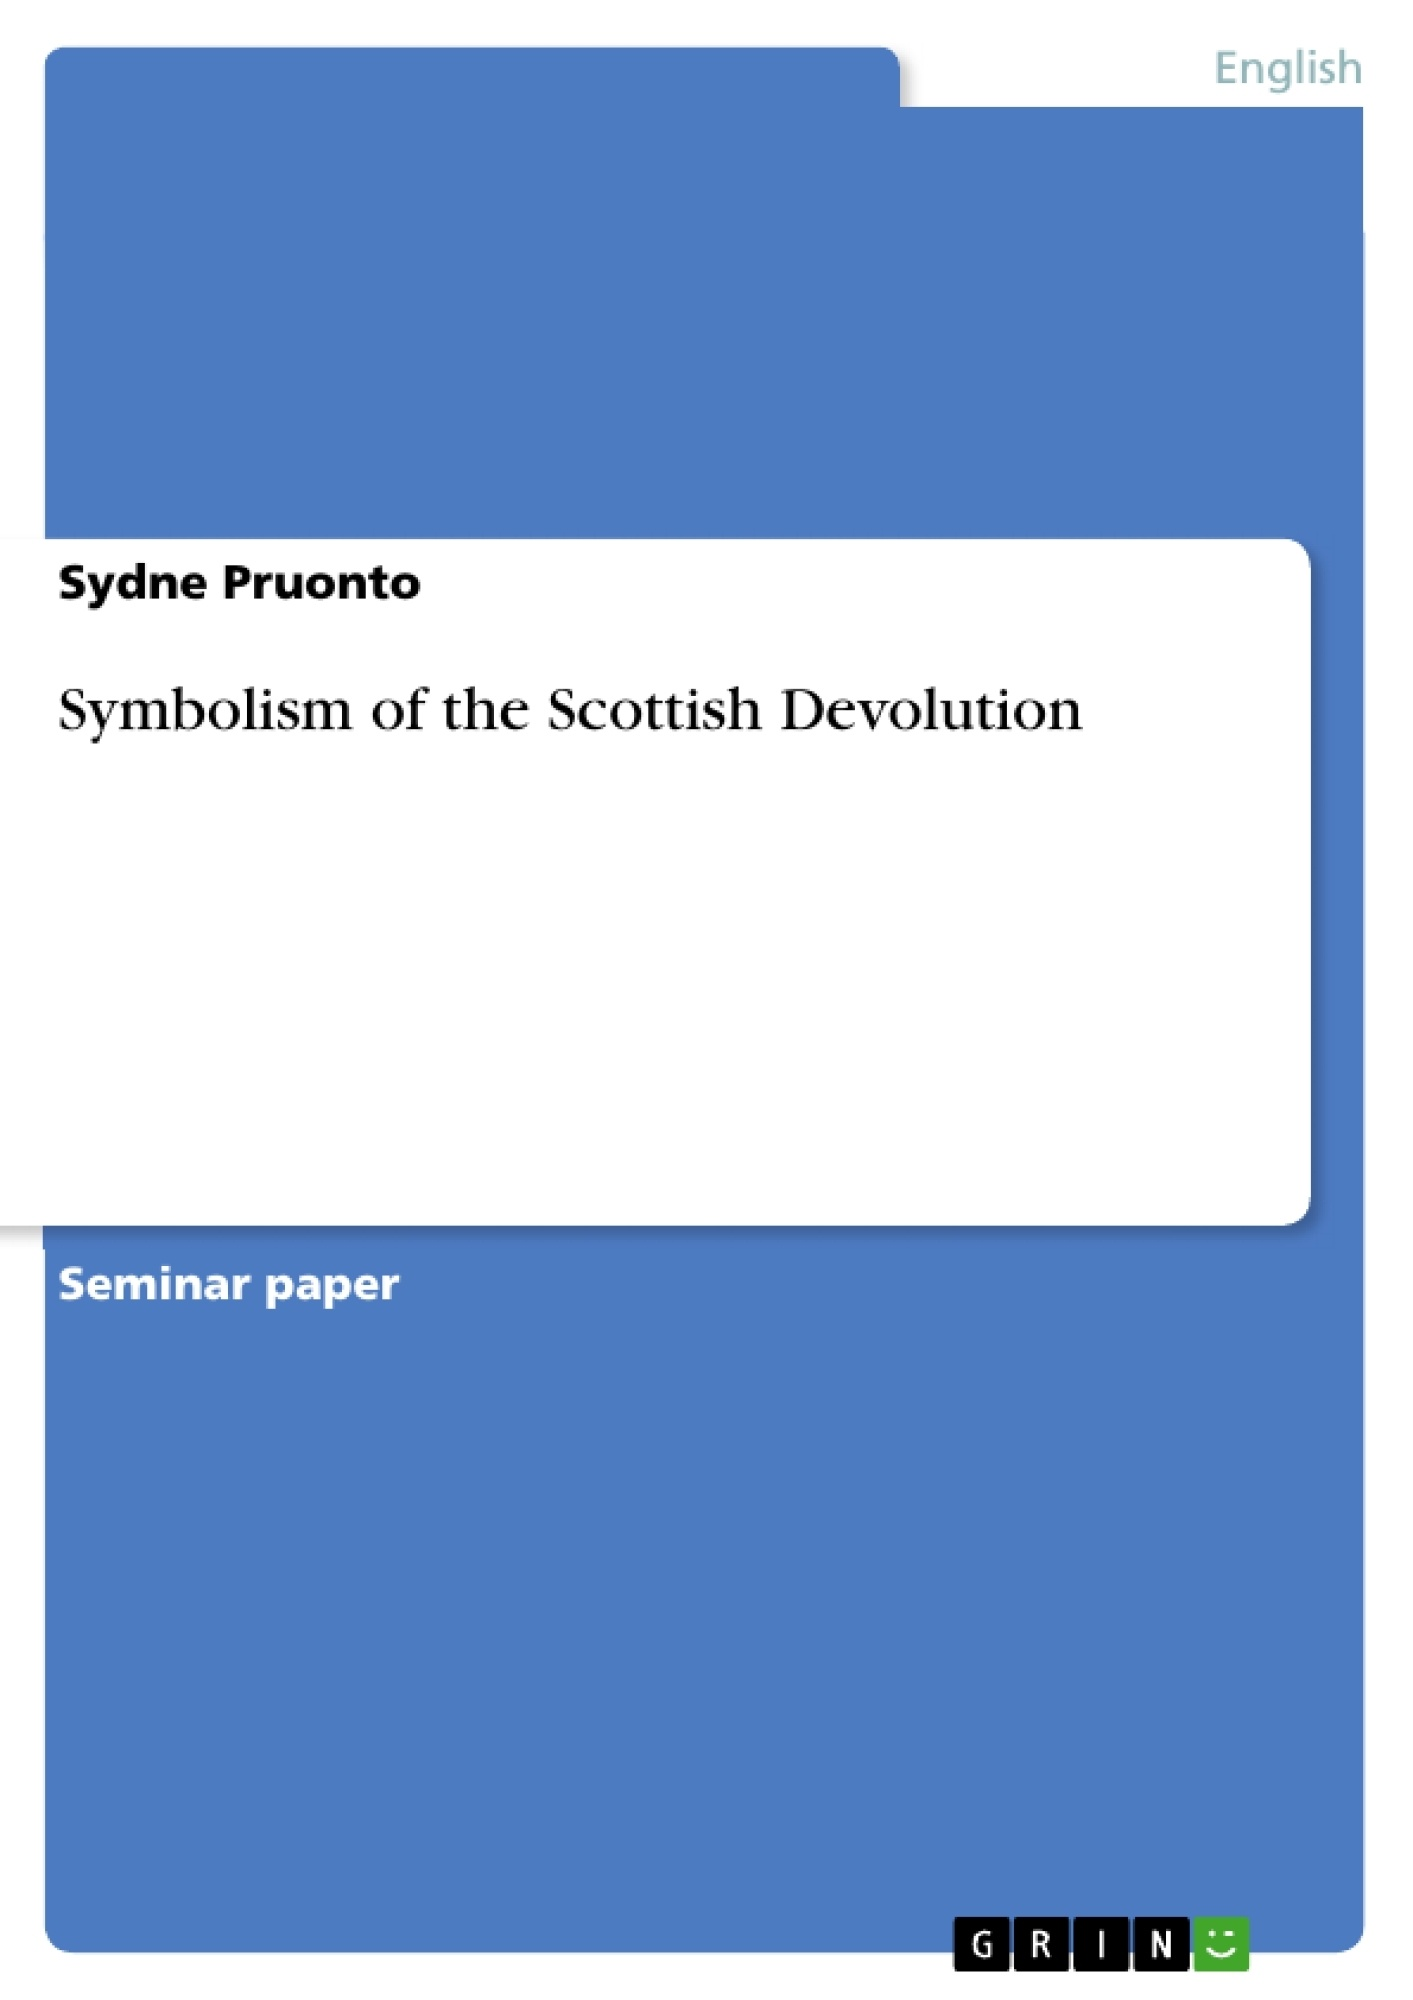 Title: Symbolism of the Scottish Devolution